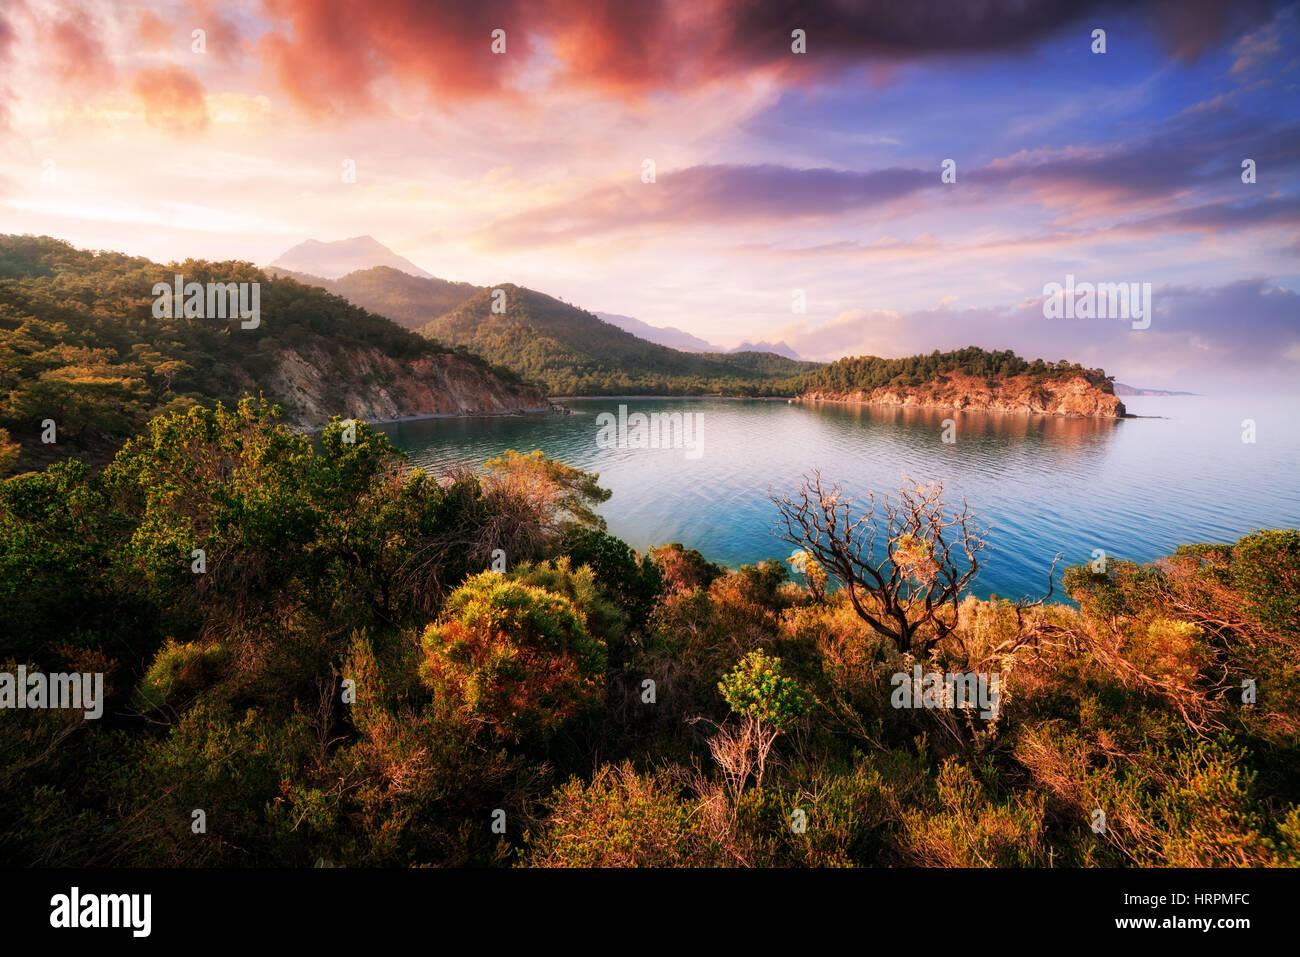 Seascape Méditerranée incroyable en Turquie Photo Stock